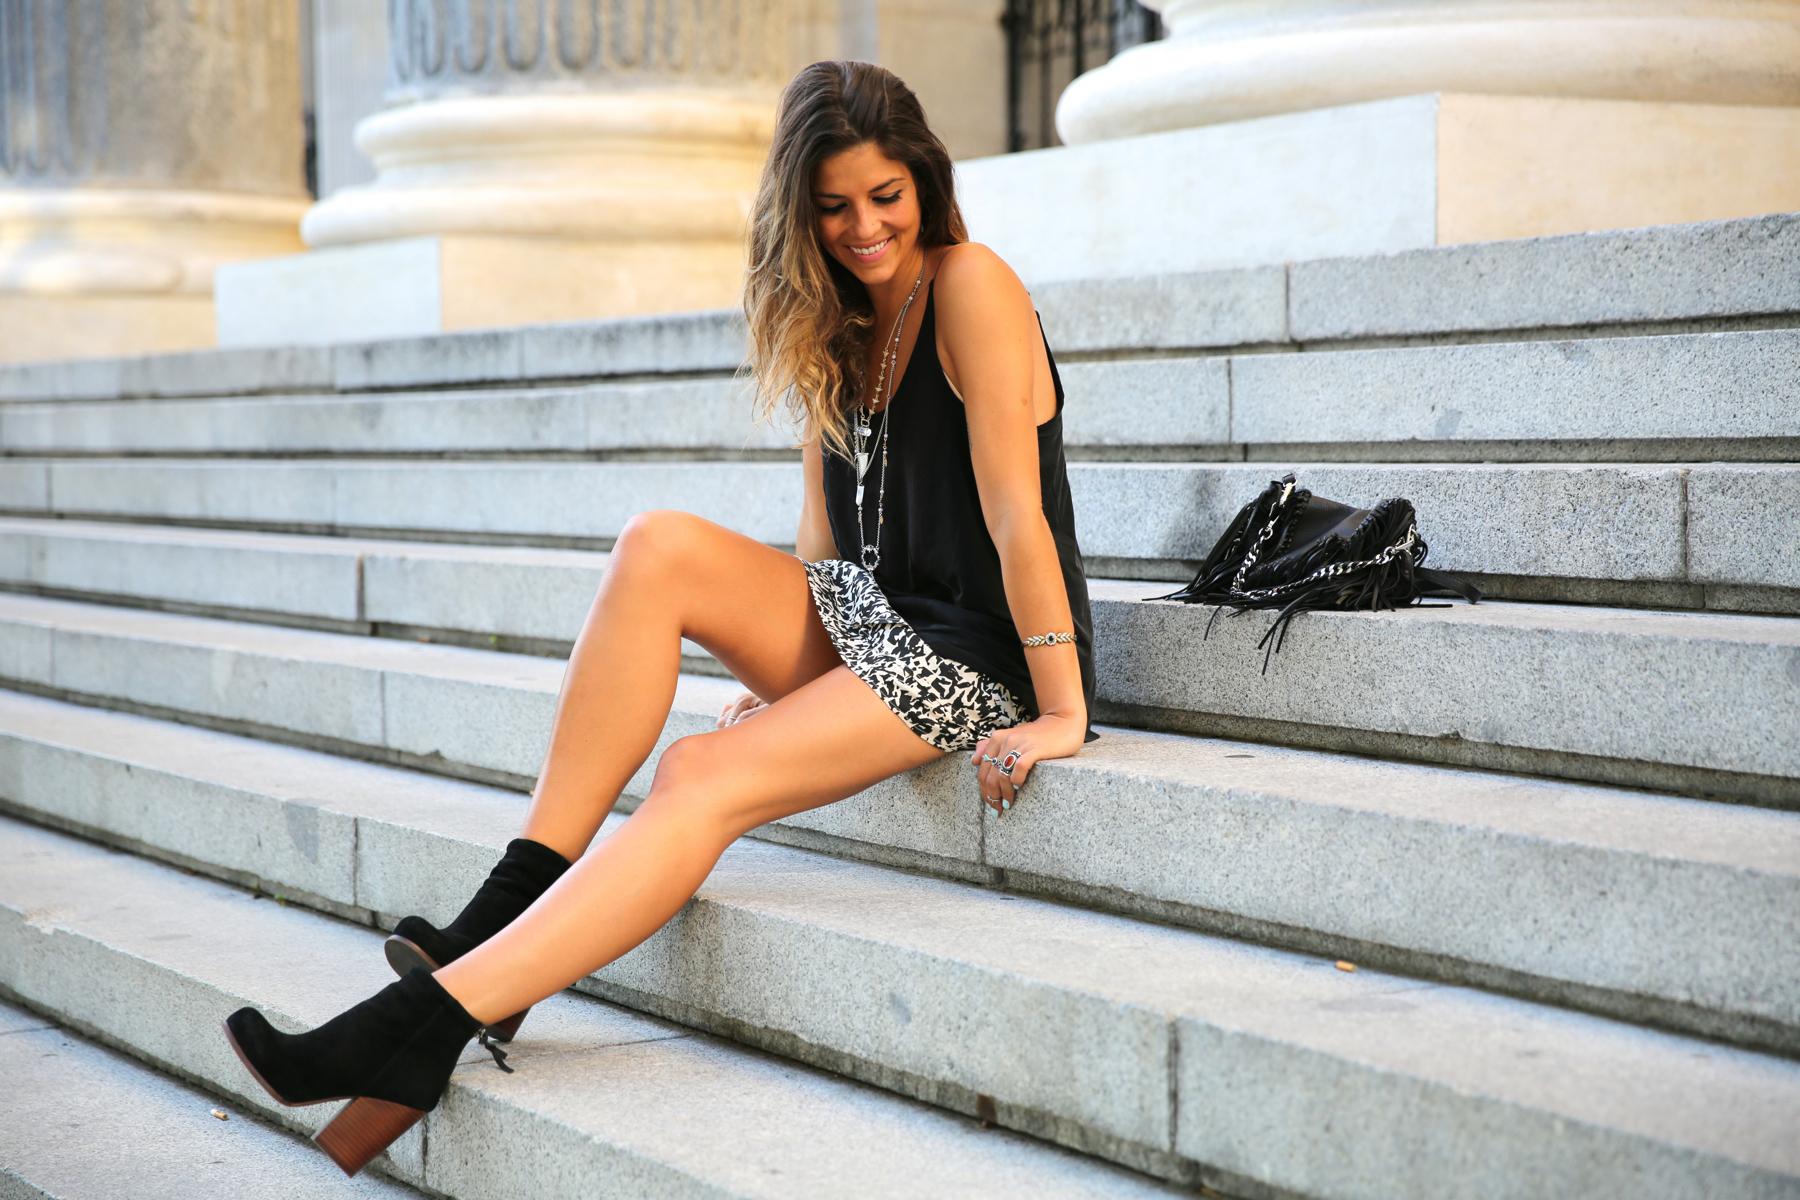 trendy_taste-look-outfit-street_style-ootd-blog-blogger-fashion_spain-moda_españa-animal_print-boho-casual-falda-skirt-black_booties-botines_negros-jeffrey_campbell-zara-bolso_flecos-vintage-9